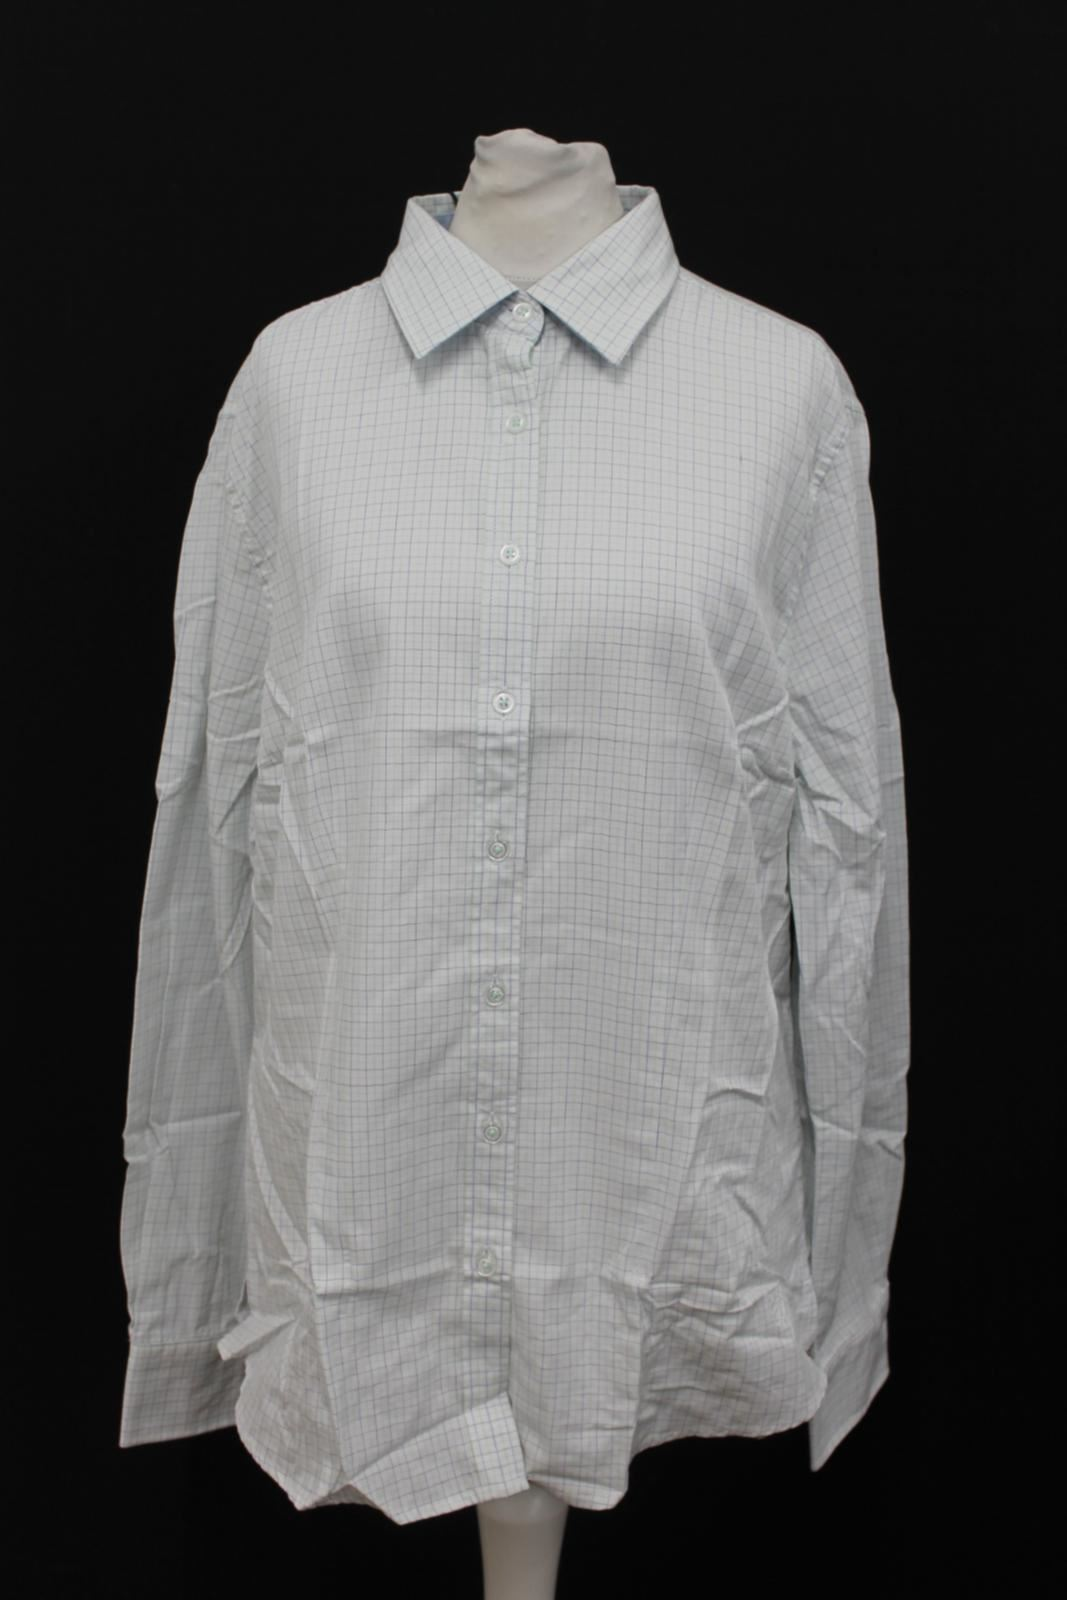 Dubarry Check Shirt Sleeve Cotton Long Lime Size Uk16 Sagewood Bnwt Ladies Eu42 gqwx04gd